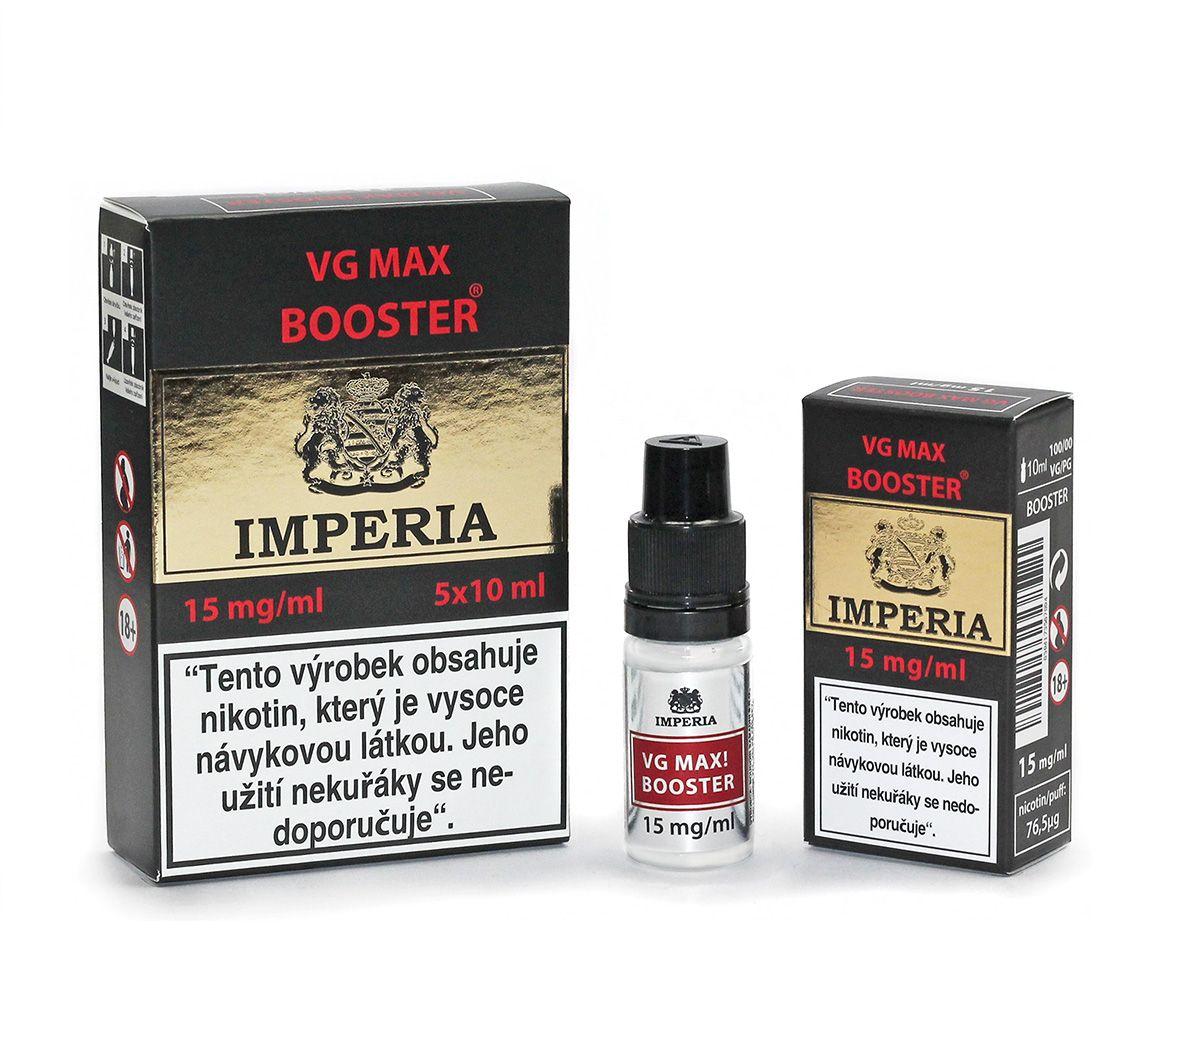 IMPERIA VG max Booster 15mg - 5x10ml (VG100%) exp. 11/20 Boudoir Samadhi s.r.o.